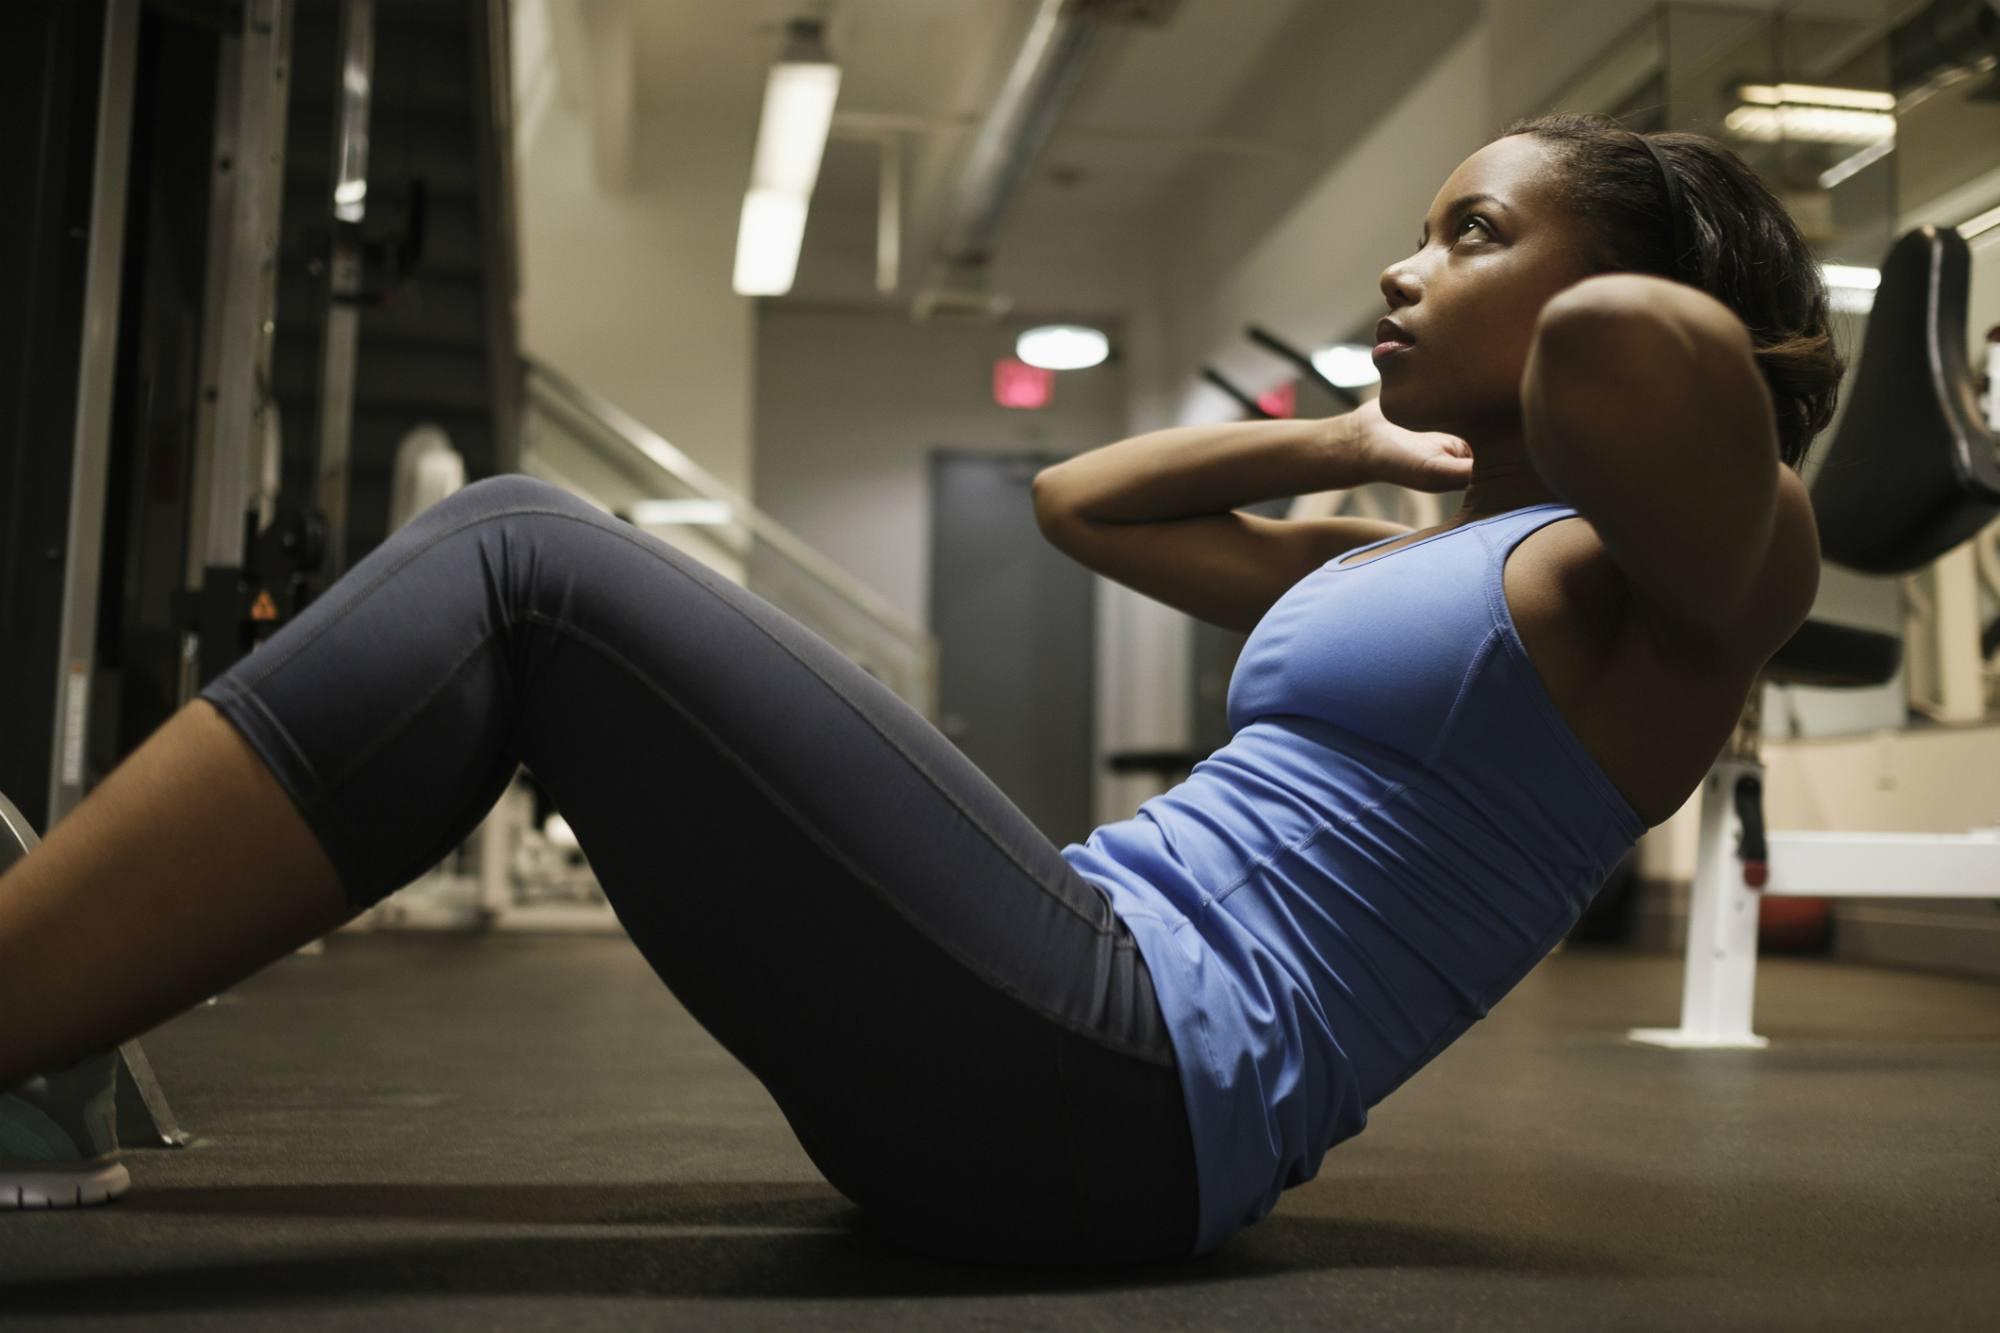 Woman doing core workout